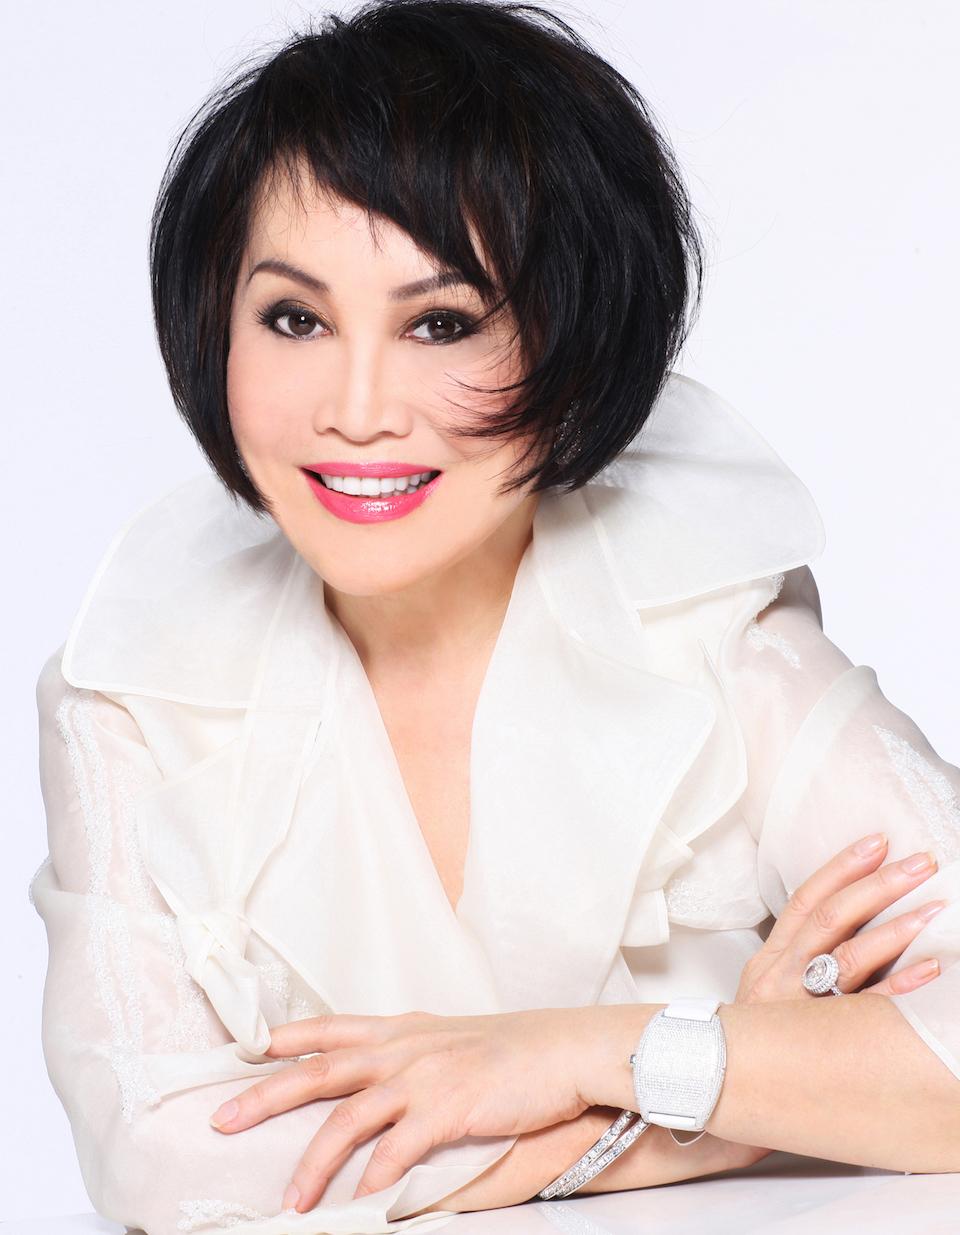 Yue Sai Kan Wikipedia